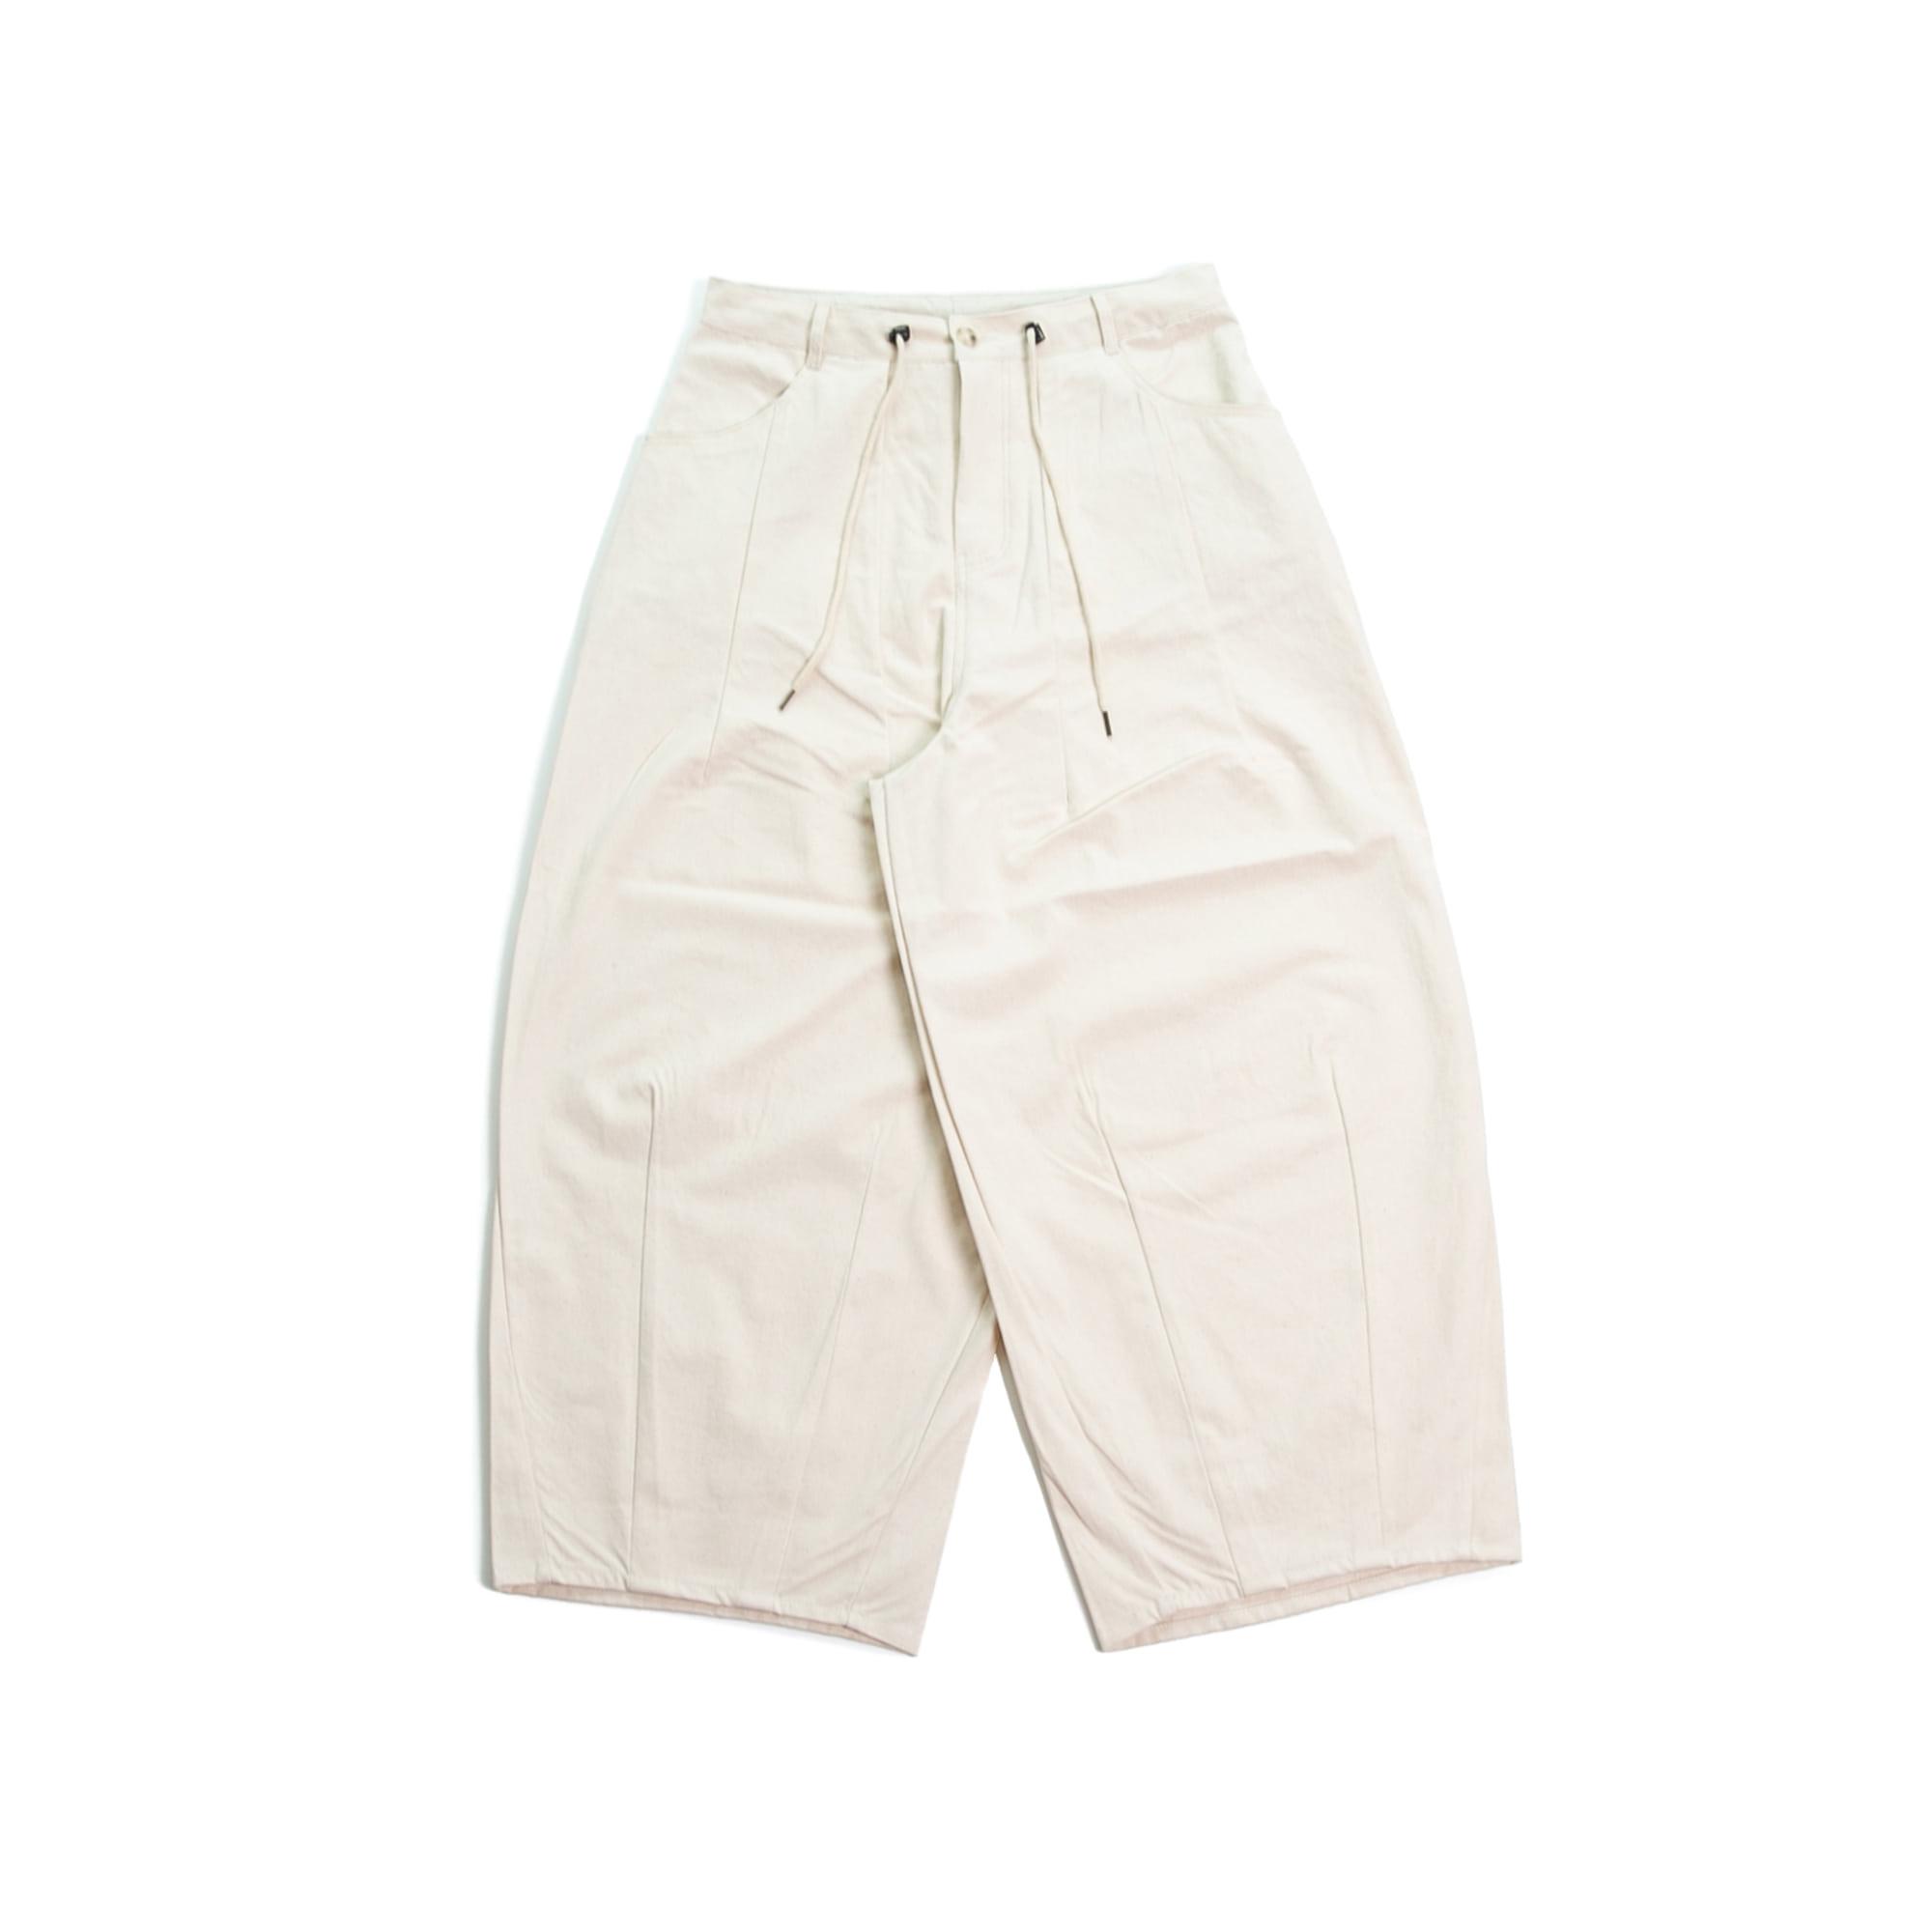 Roof Cotton Balloon Pants - Ivory